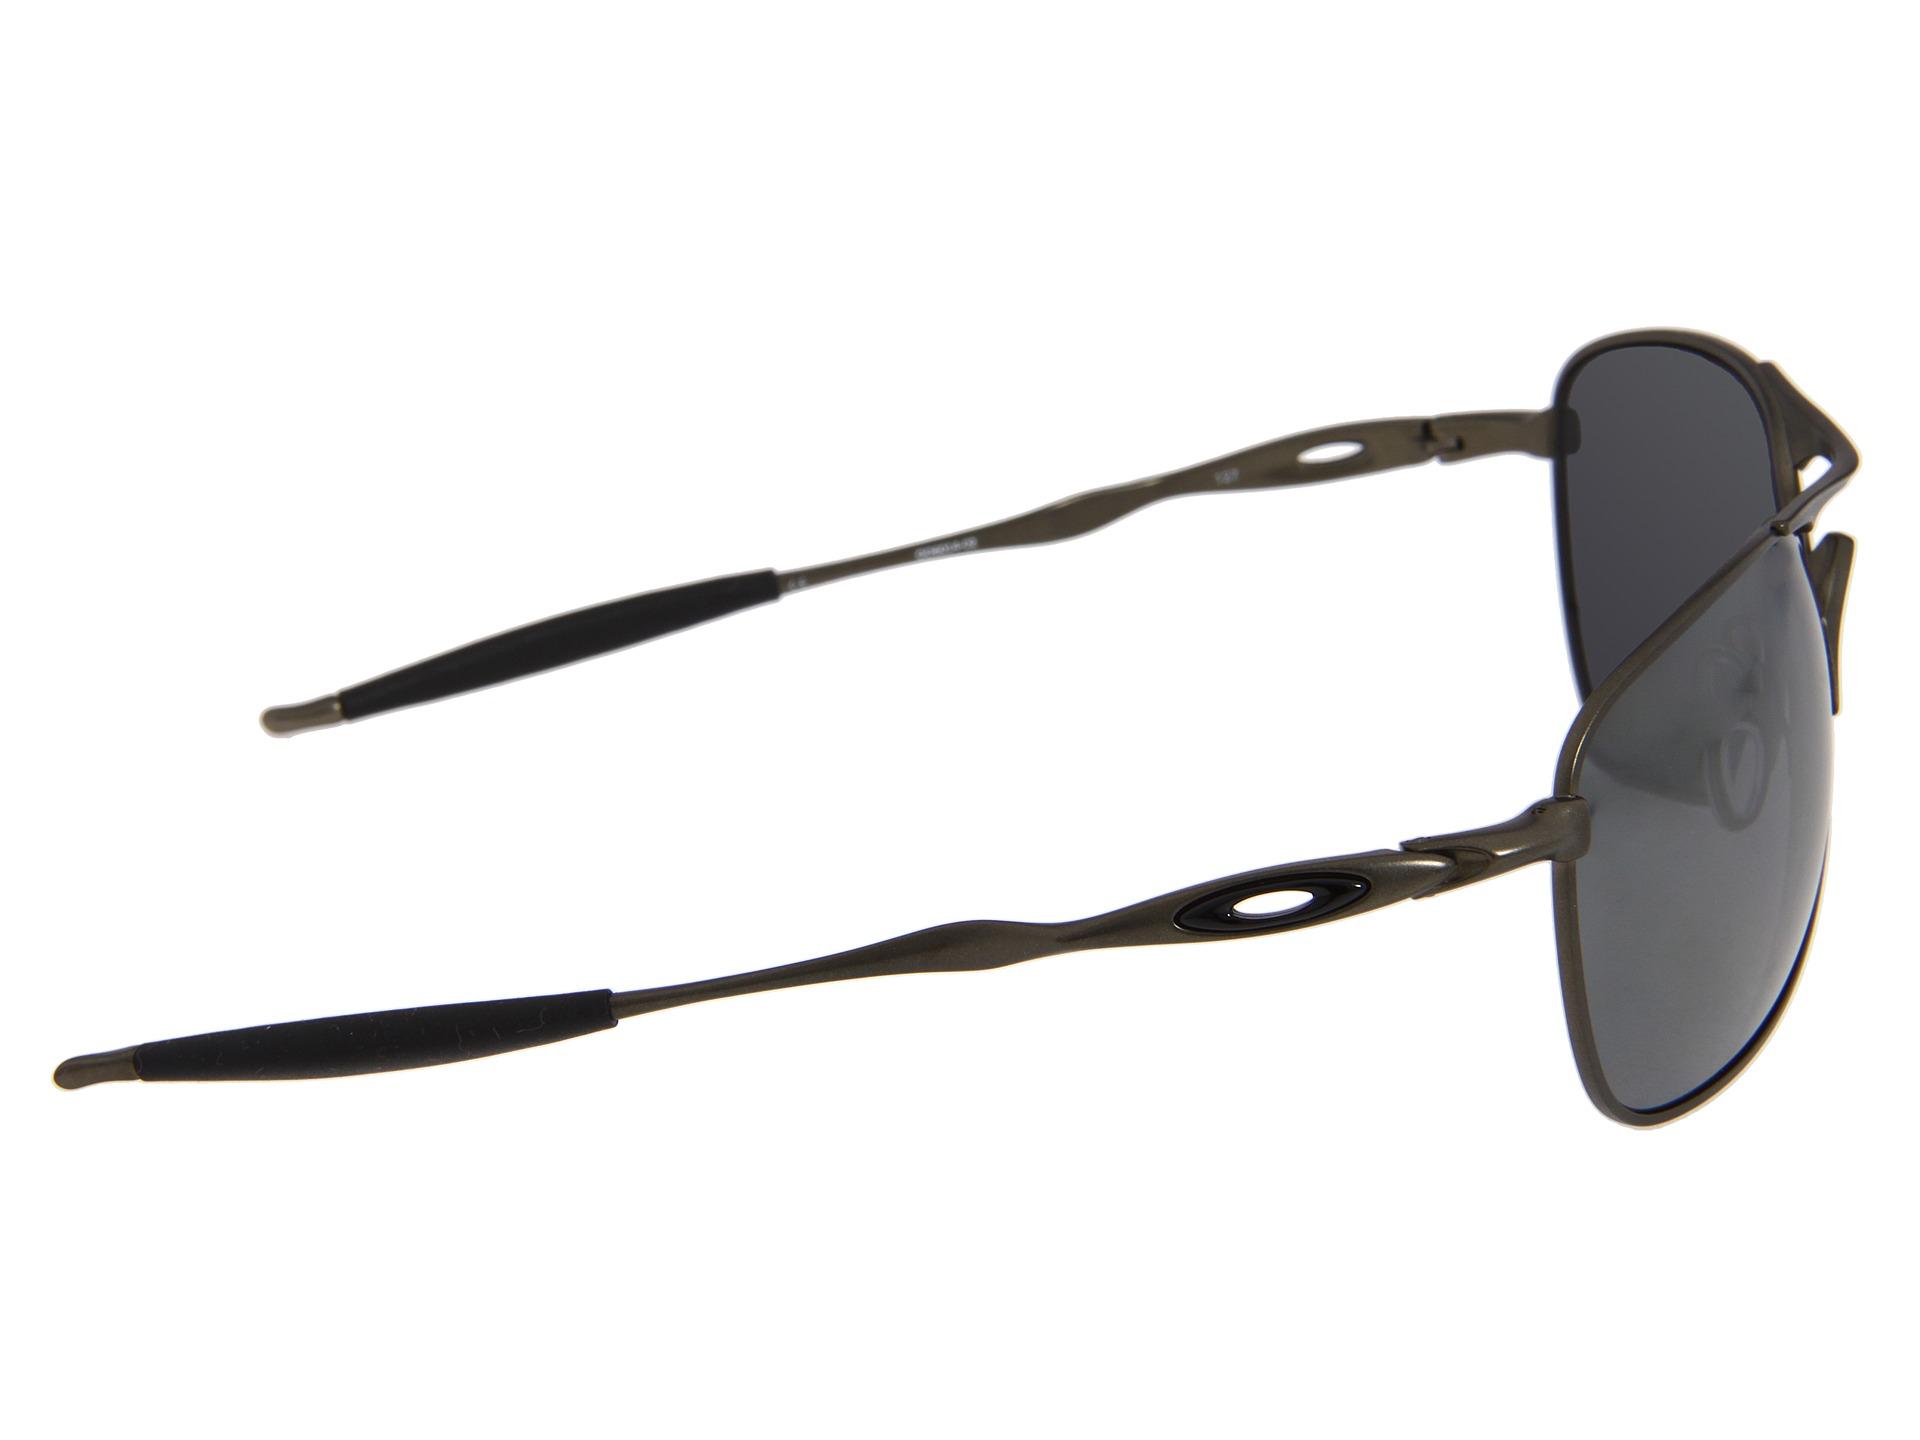 92cdbf46d7 Oakley Crosshair Ti Pewter « Heritage Malta